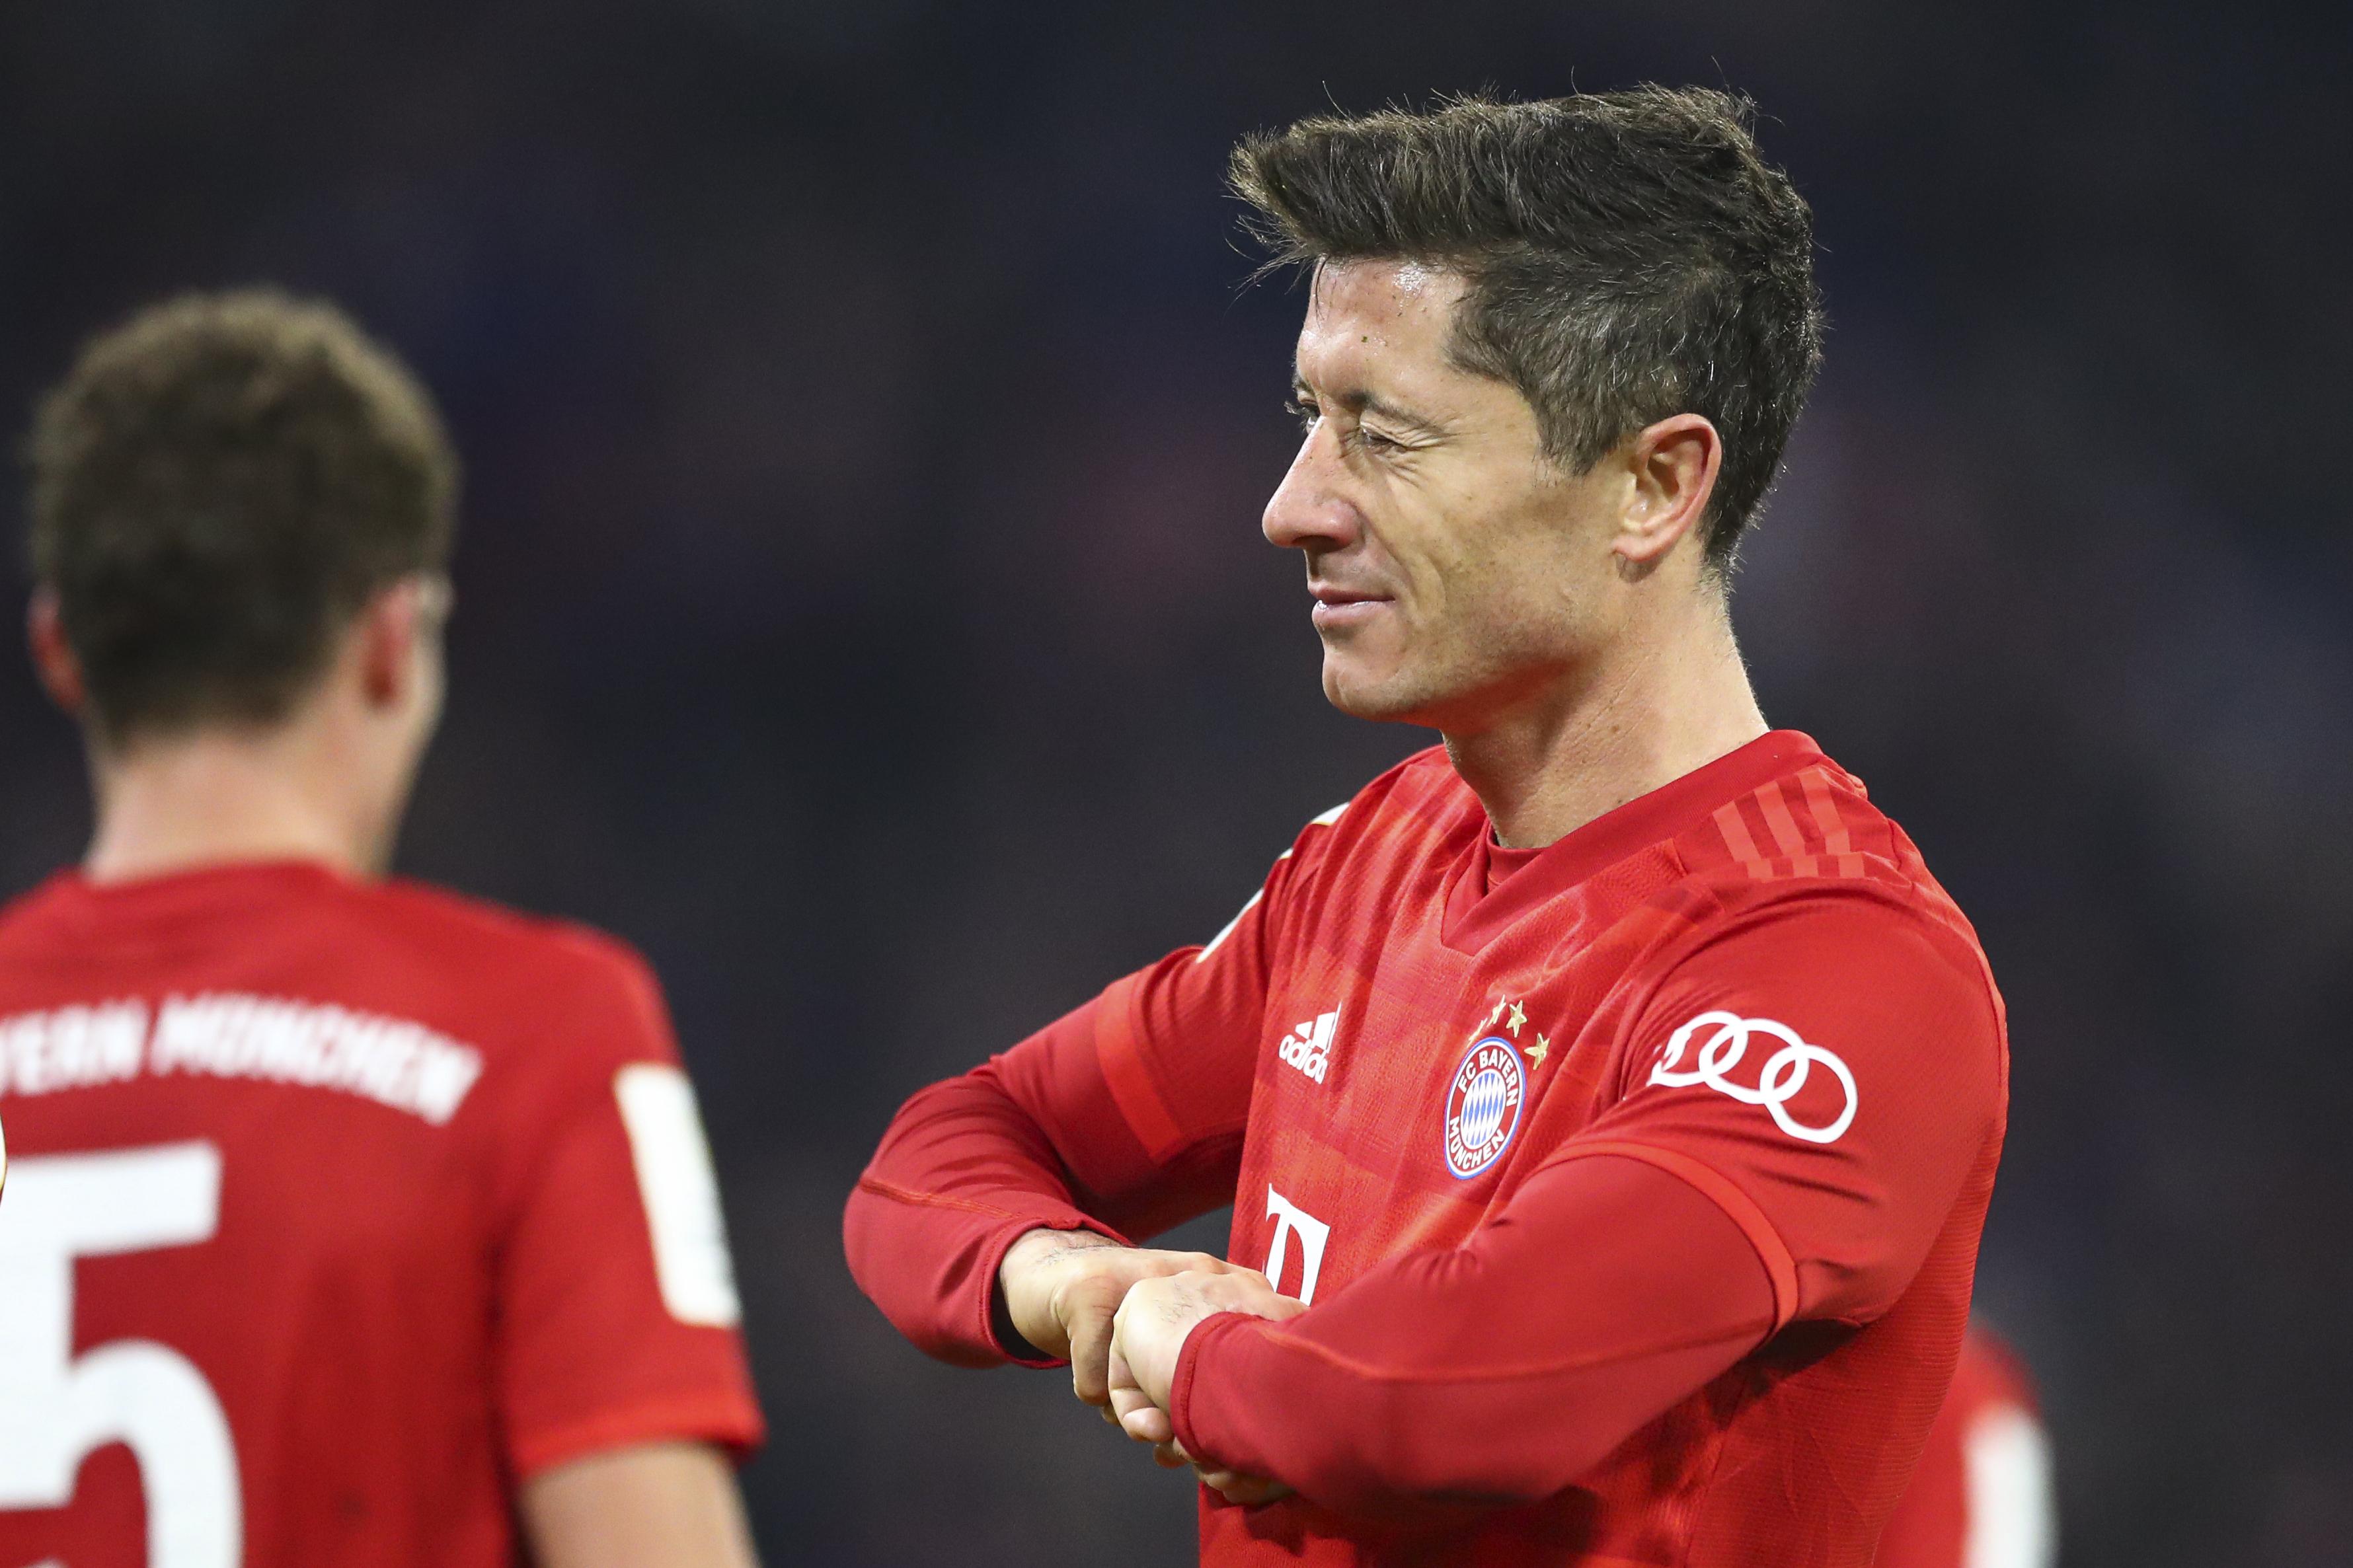 Lewandowski scores 2 as Bayern beats Hoffenheim 4-3 in cup